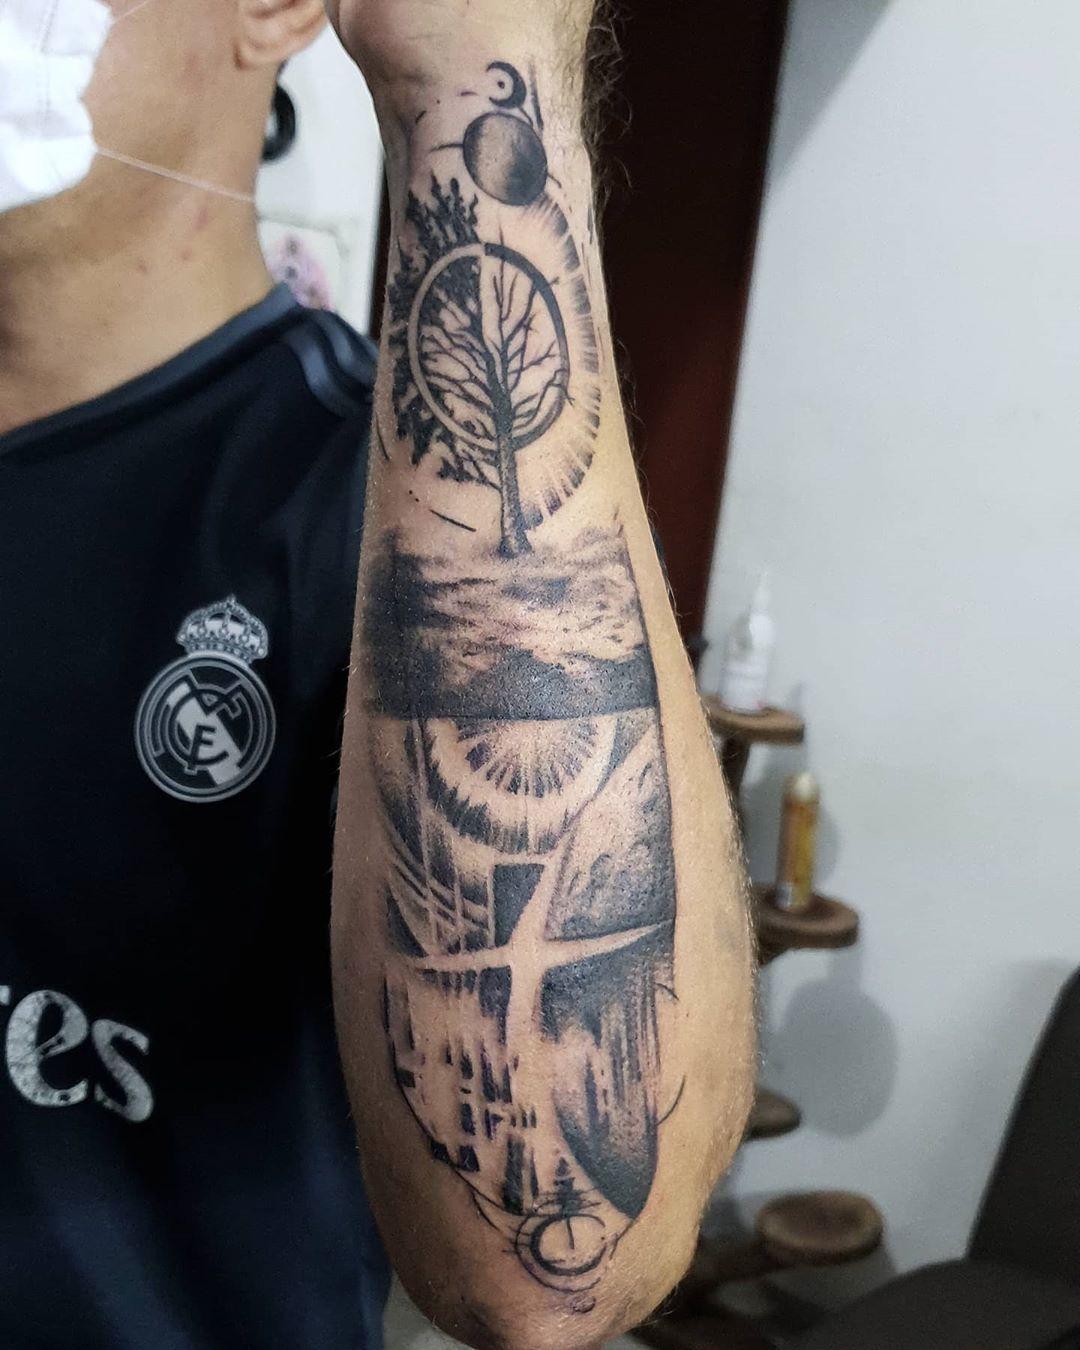 #tattoo #tattoostyle #tatuadoresmexicanos #mexico #merida #yucatán #lovetattoo #tattoo #tattoolovers 3#tattoo de 3